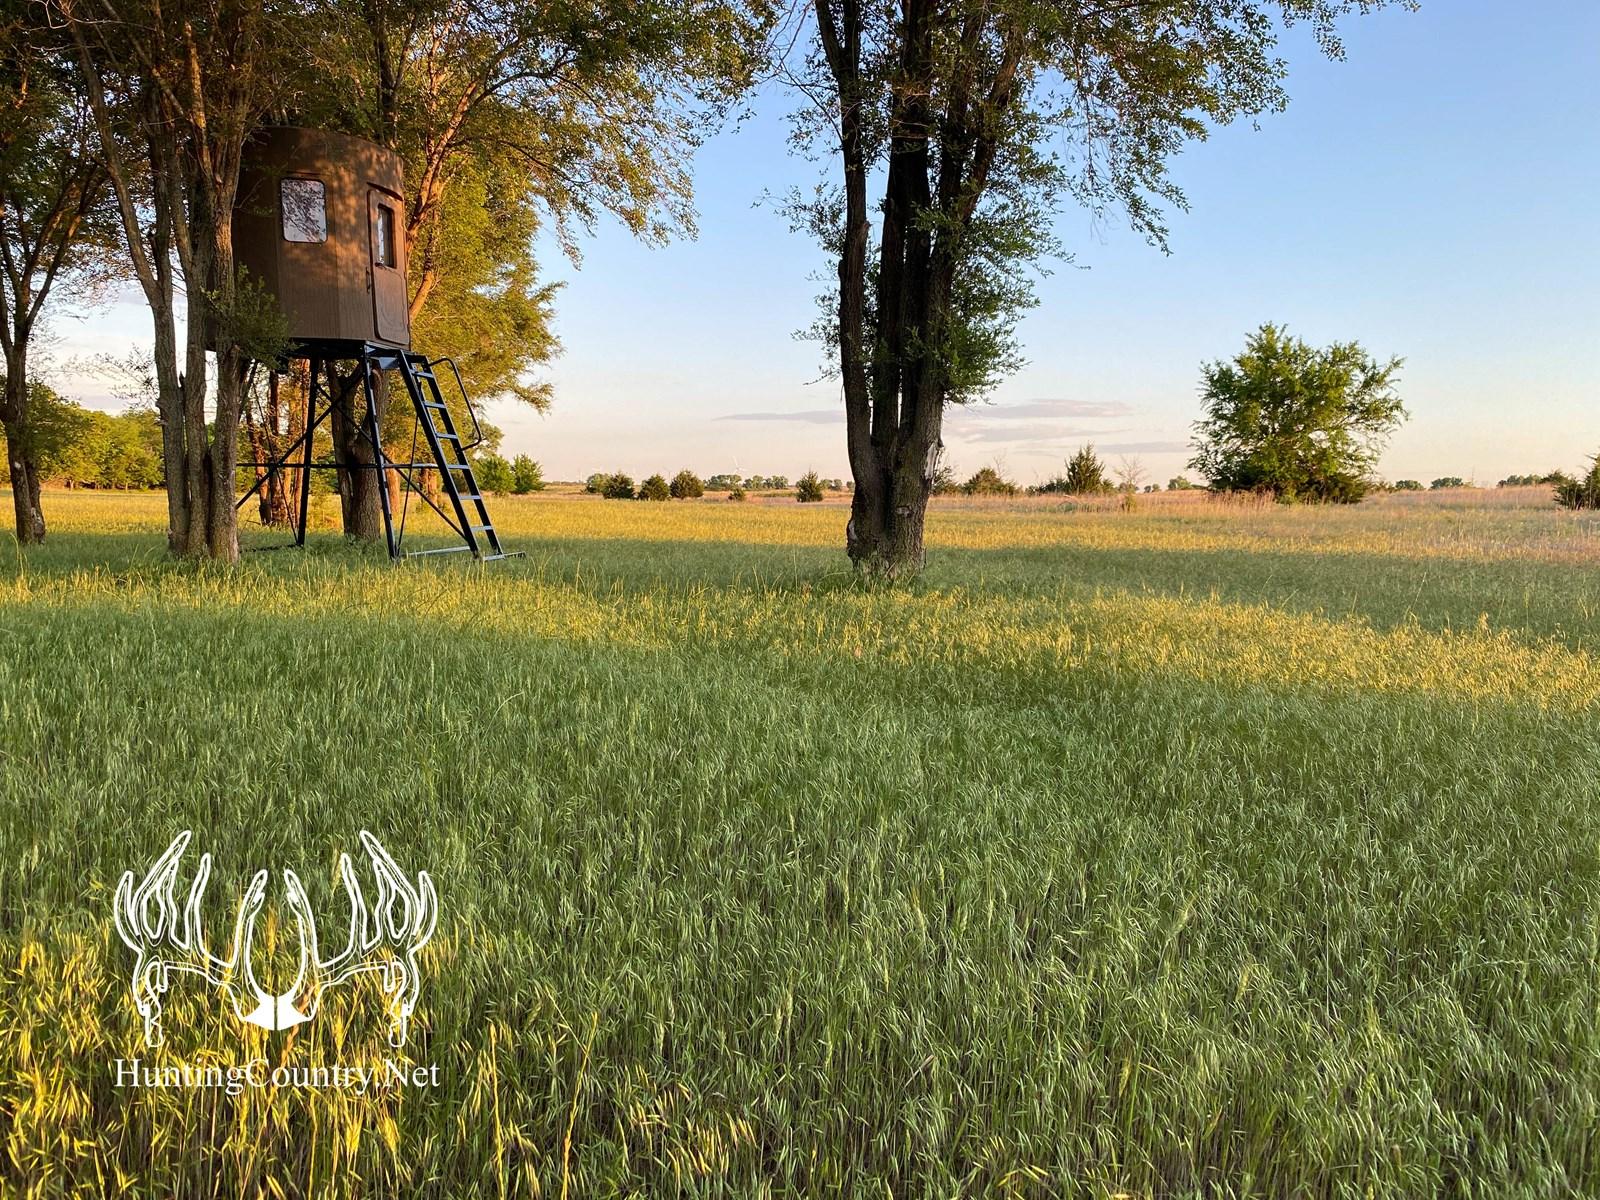 Kingman County, Kansas 275 Acre Land For Sale